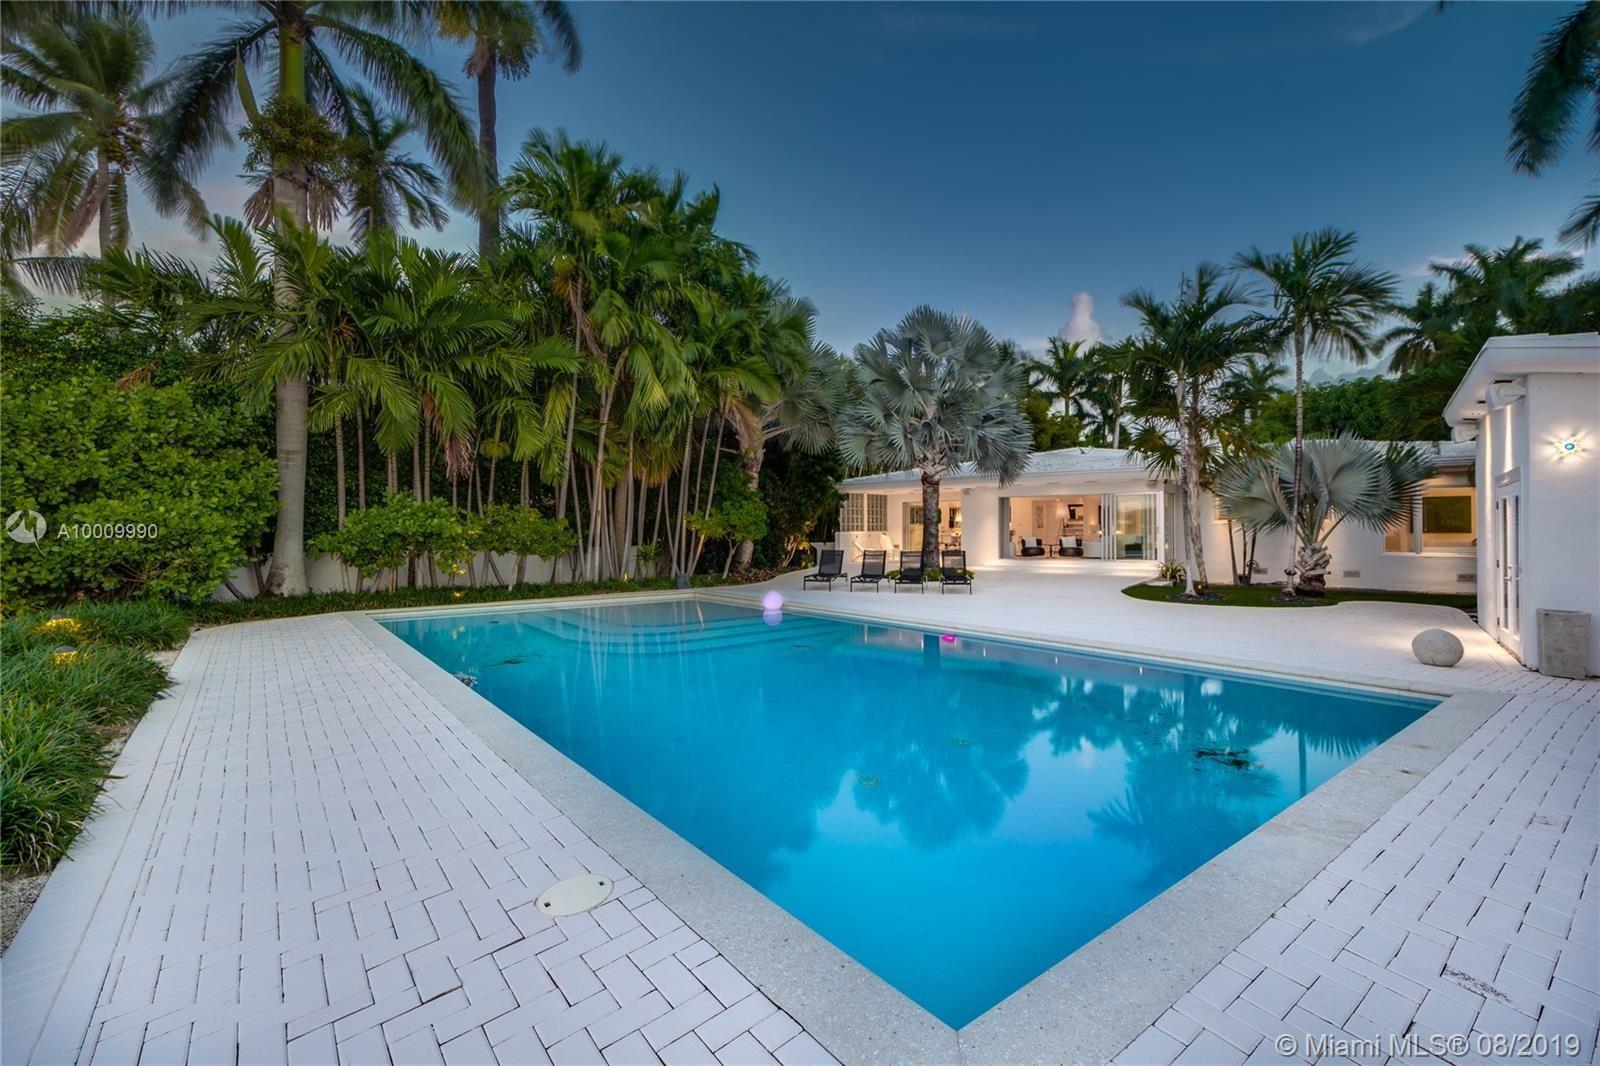 Photo 5 of Listing MLS a10009990 in 6050 N Bay Rd Miami Beach FL 33140